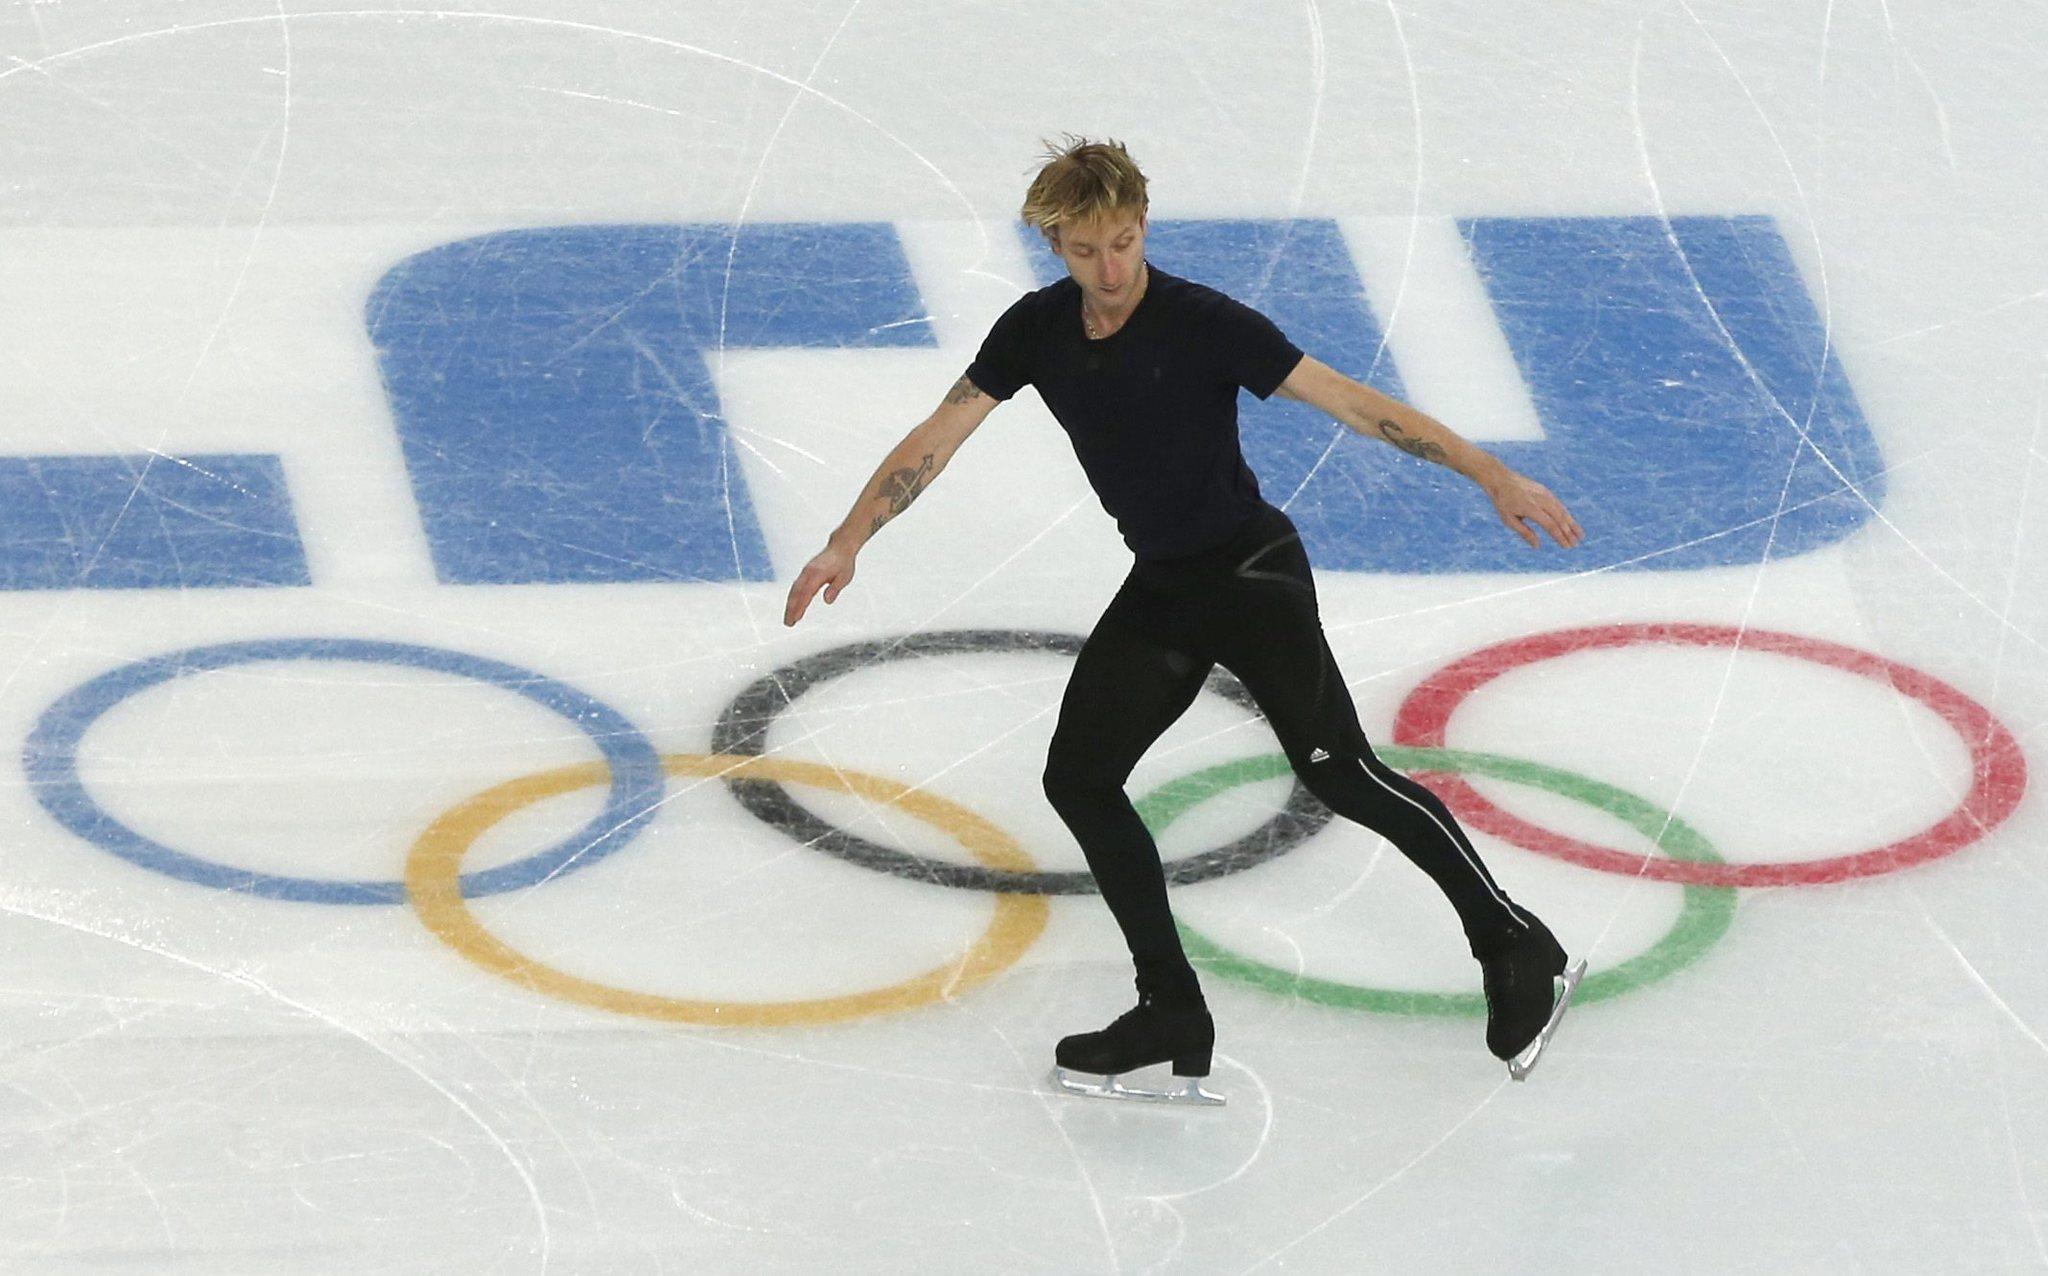 Russia's Evgeny Plushenko during a practice session at the Iceberg Skating Palace in Sochi. (Barbara Walton/EPA Photo)